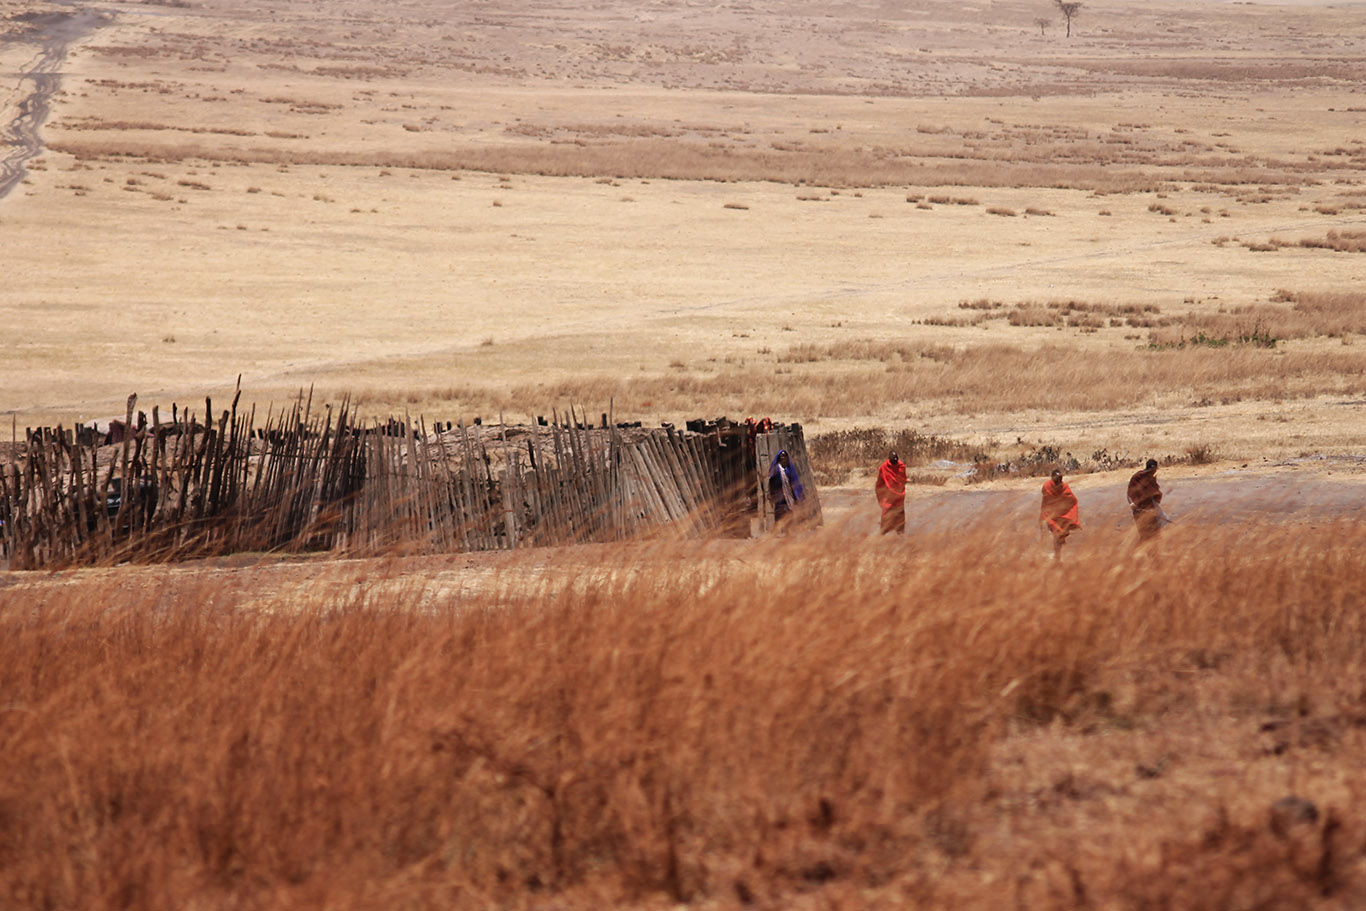 tanzania-popolo-zeppelin-viaggiamondo